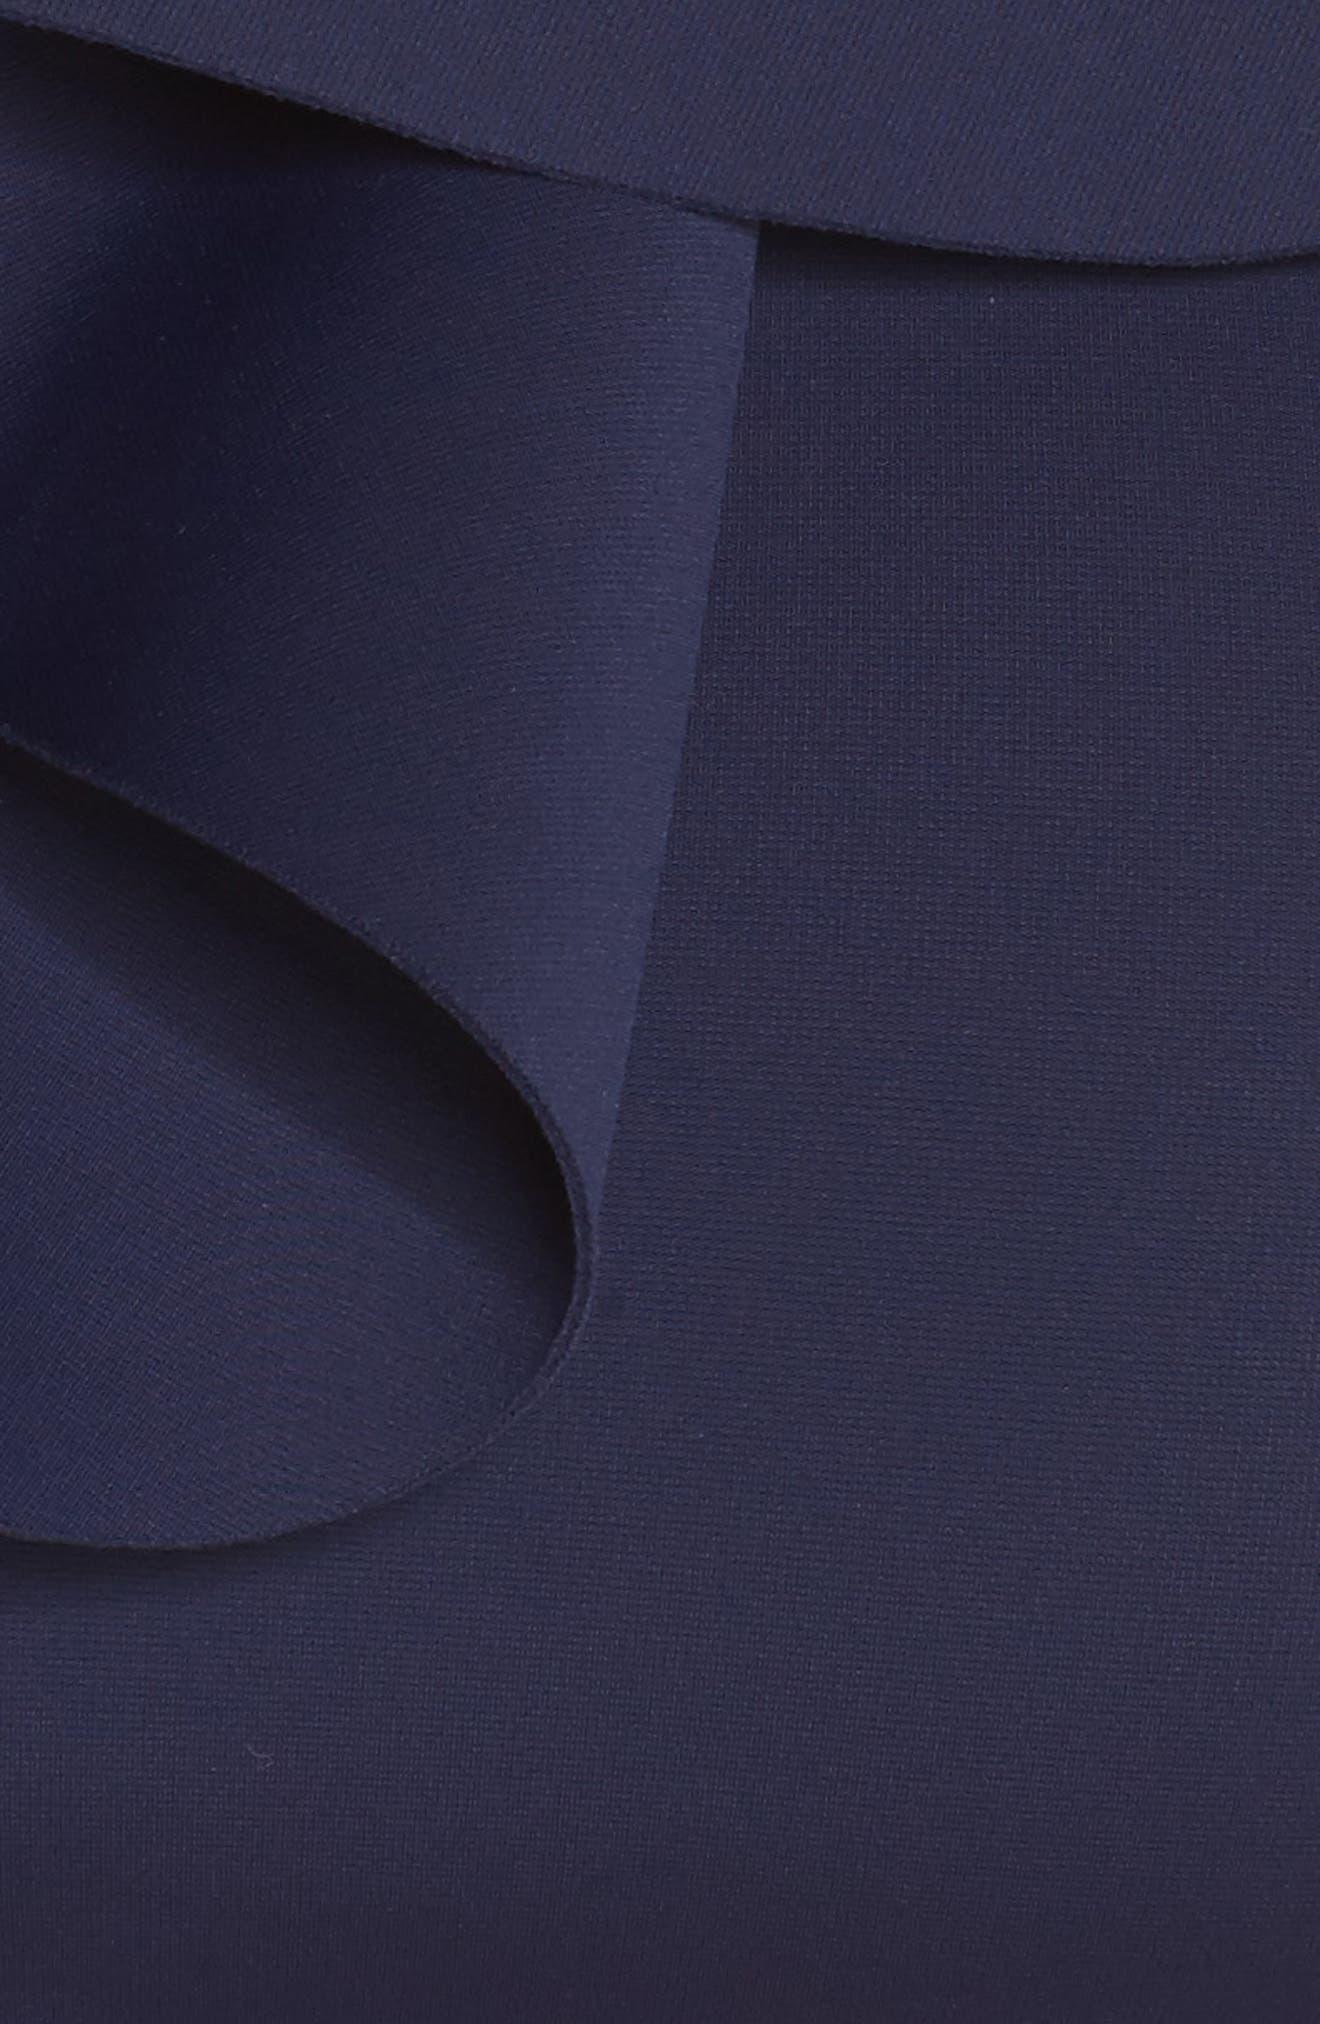 Ruffle Bikini Top,                             Alternate thumbnail 5, color,                             Navy